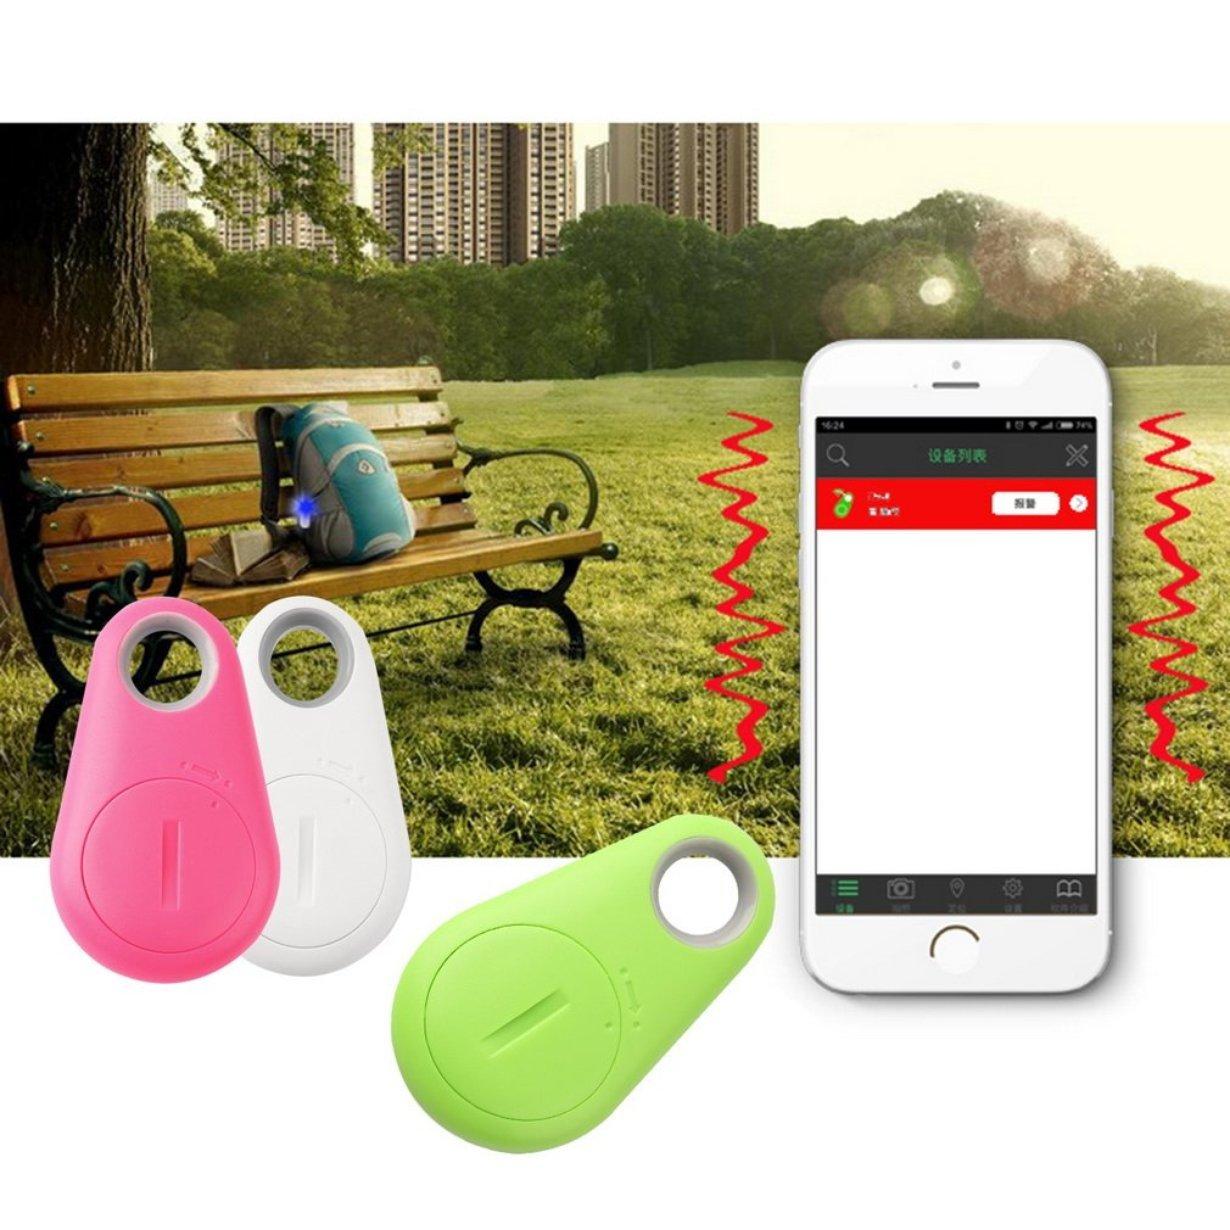 camellia Mini Fashion 4.0 Verfolger-Verzeichnis Tag Alarm Walle Key Hund Tracker Anti-verlorene Tasche Gr/ö/ße Smart-Tracker pink